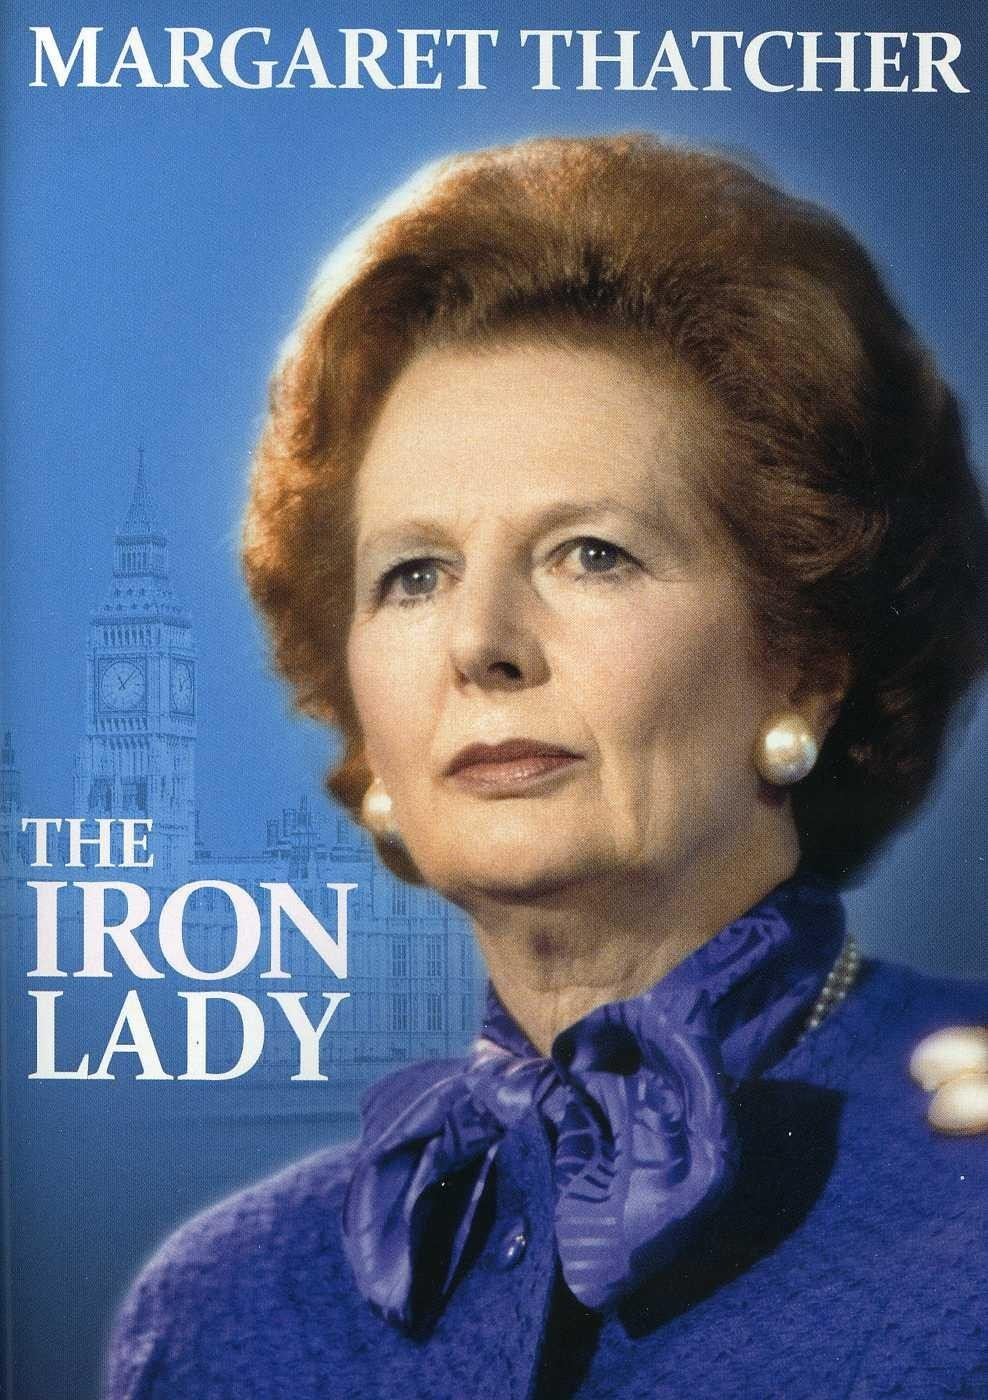 Alzheimer's Disease Takes Thatcher